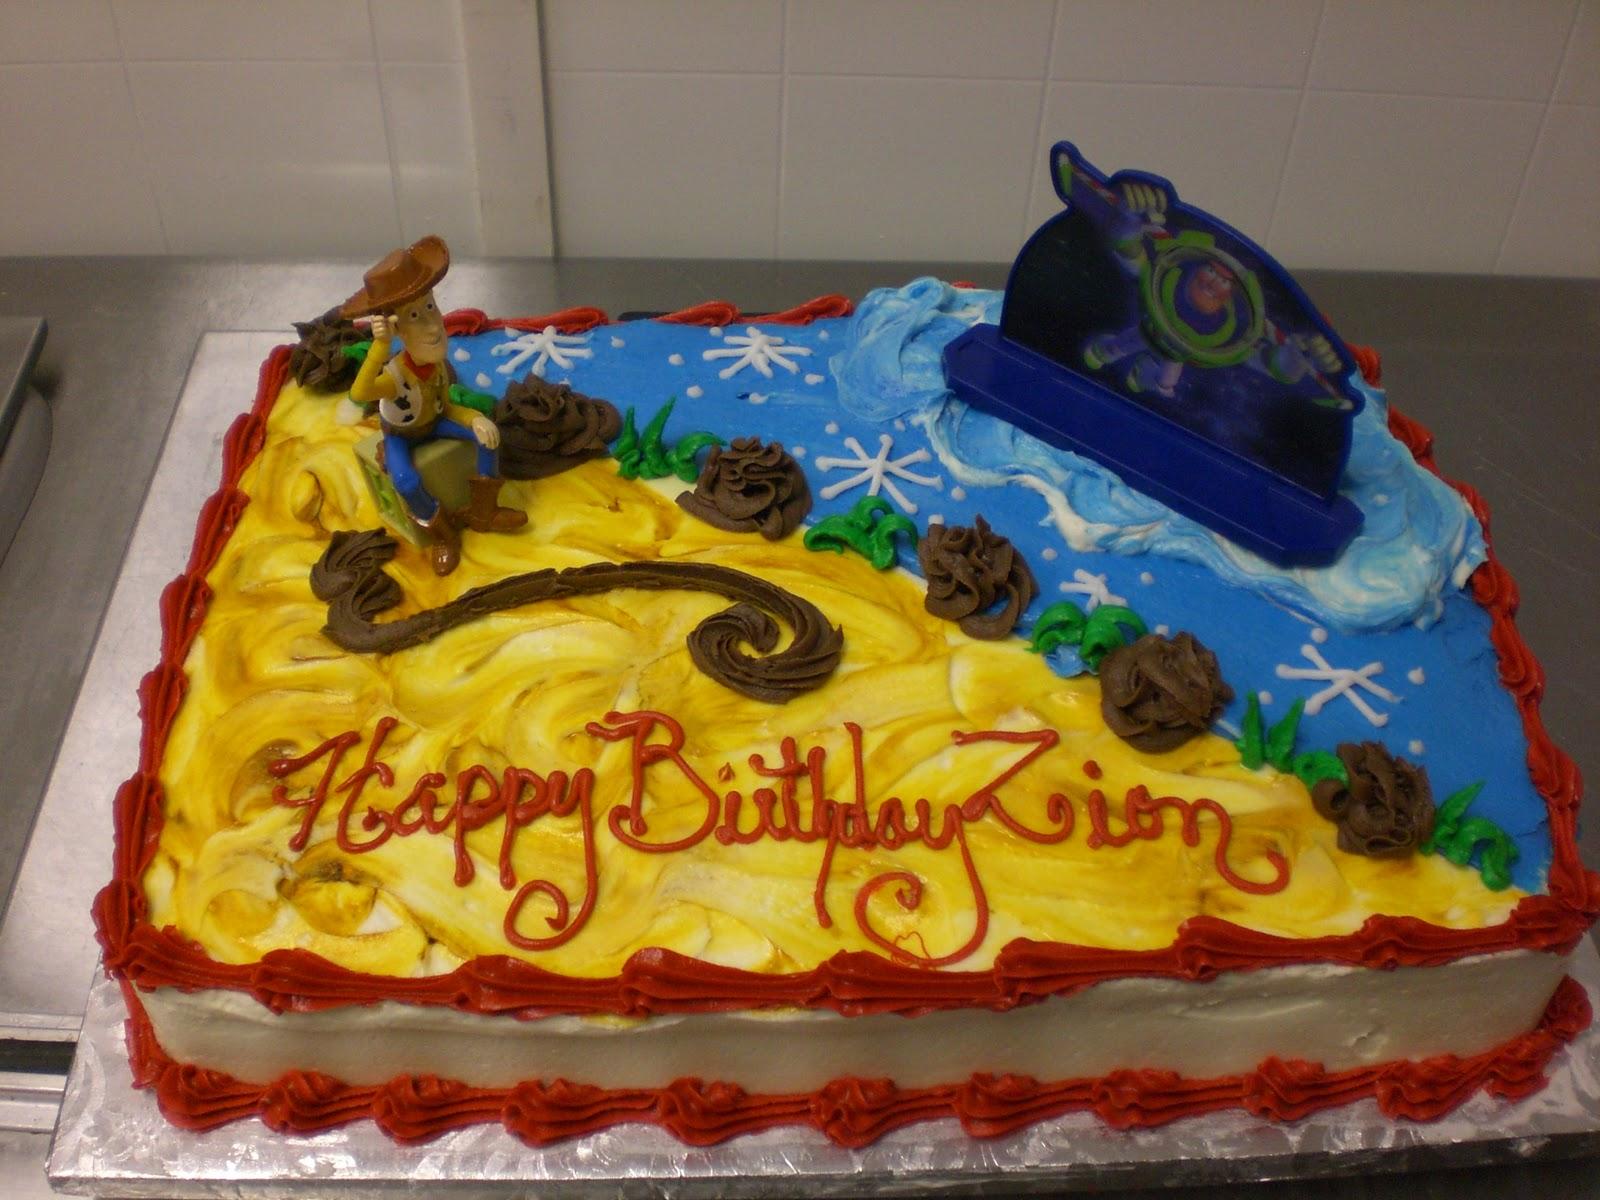 Cake Art Lawrenceville Hwy : CAFE AROMAS: Toy Story Cake